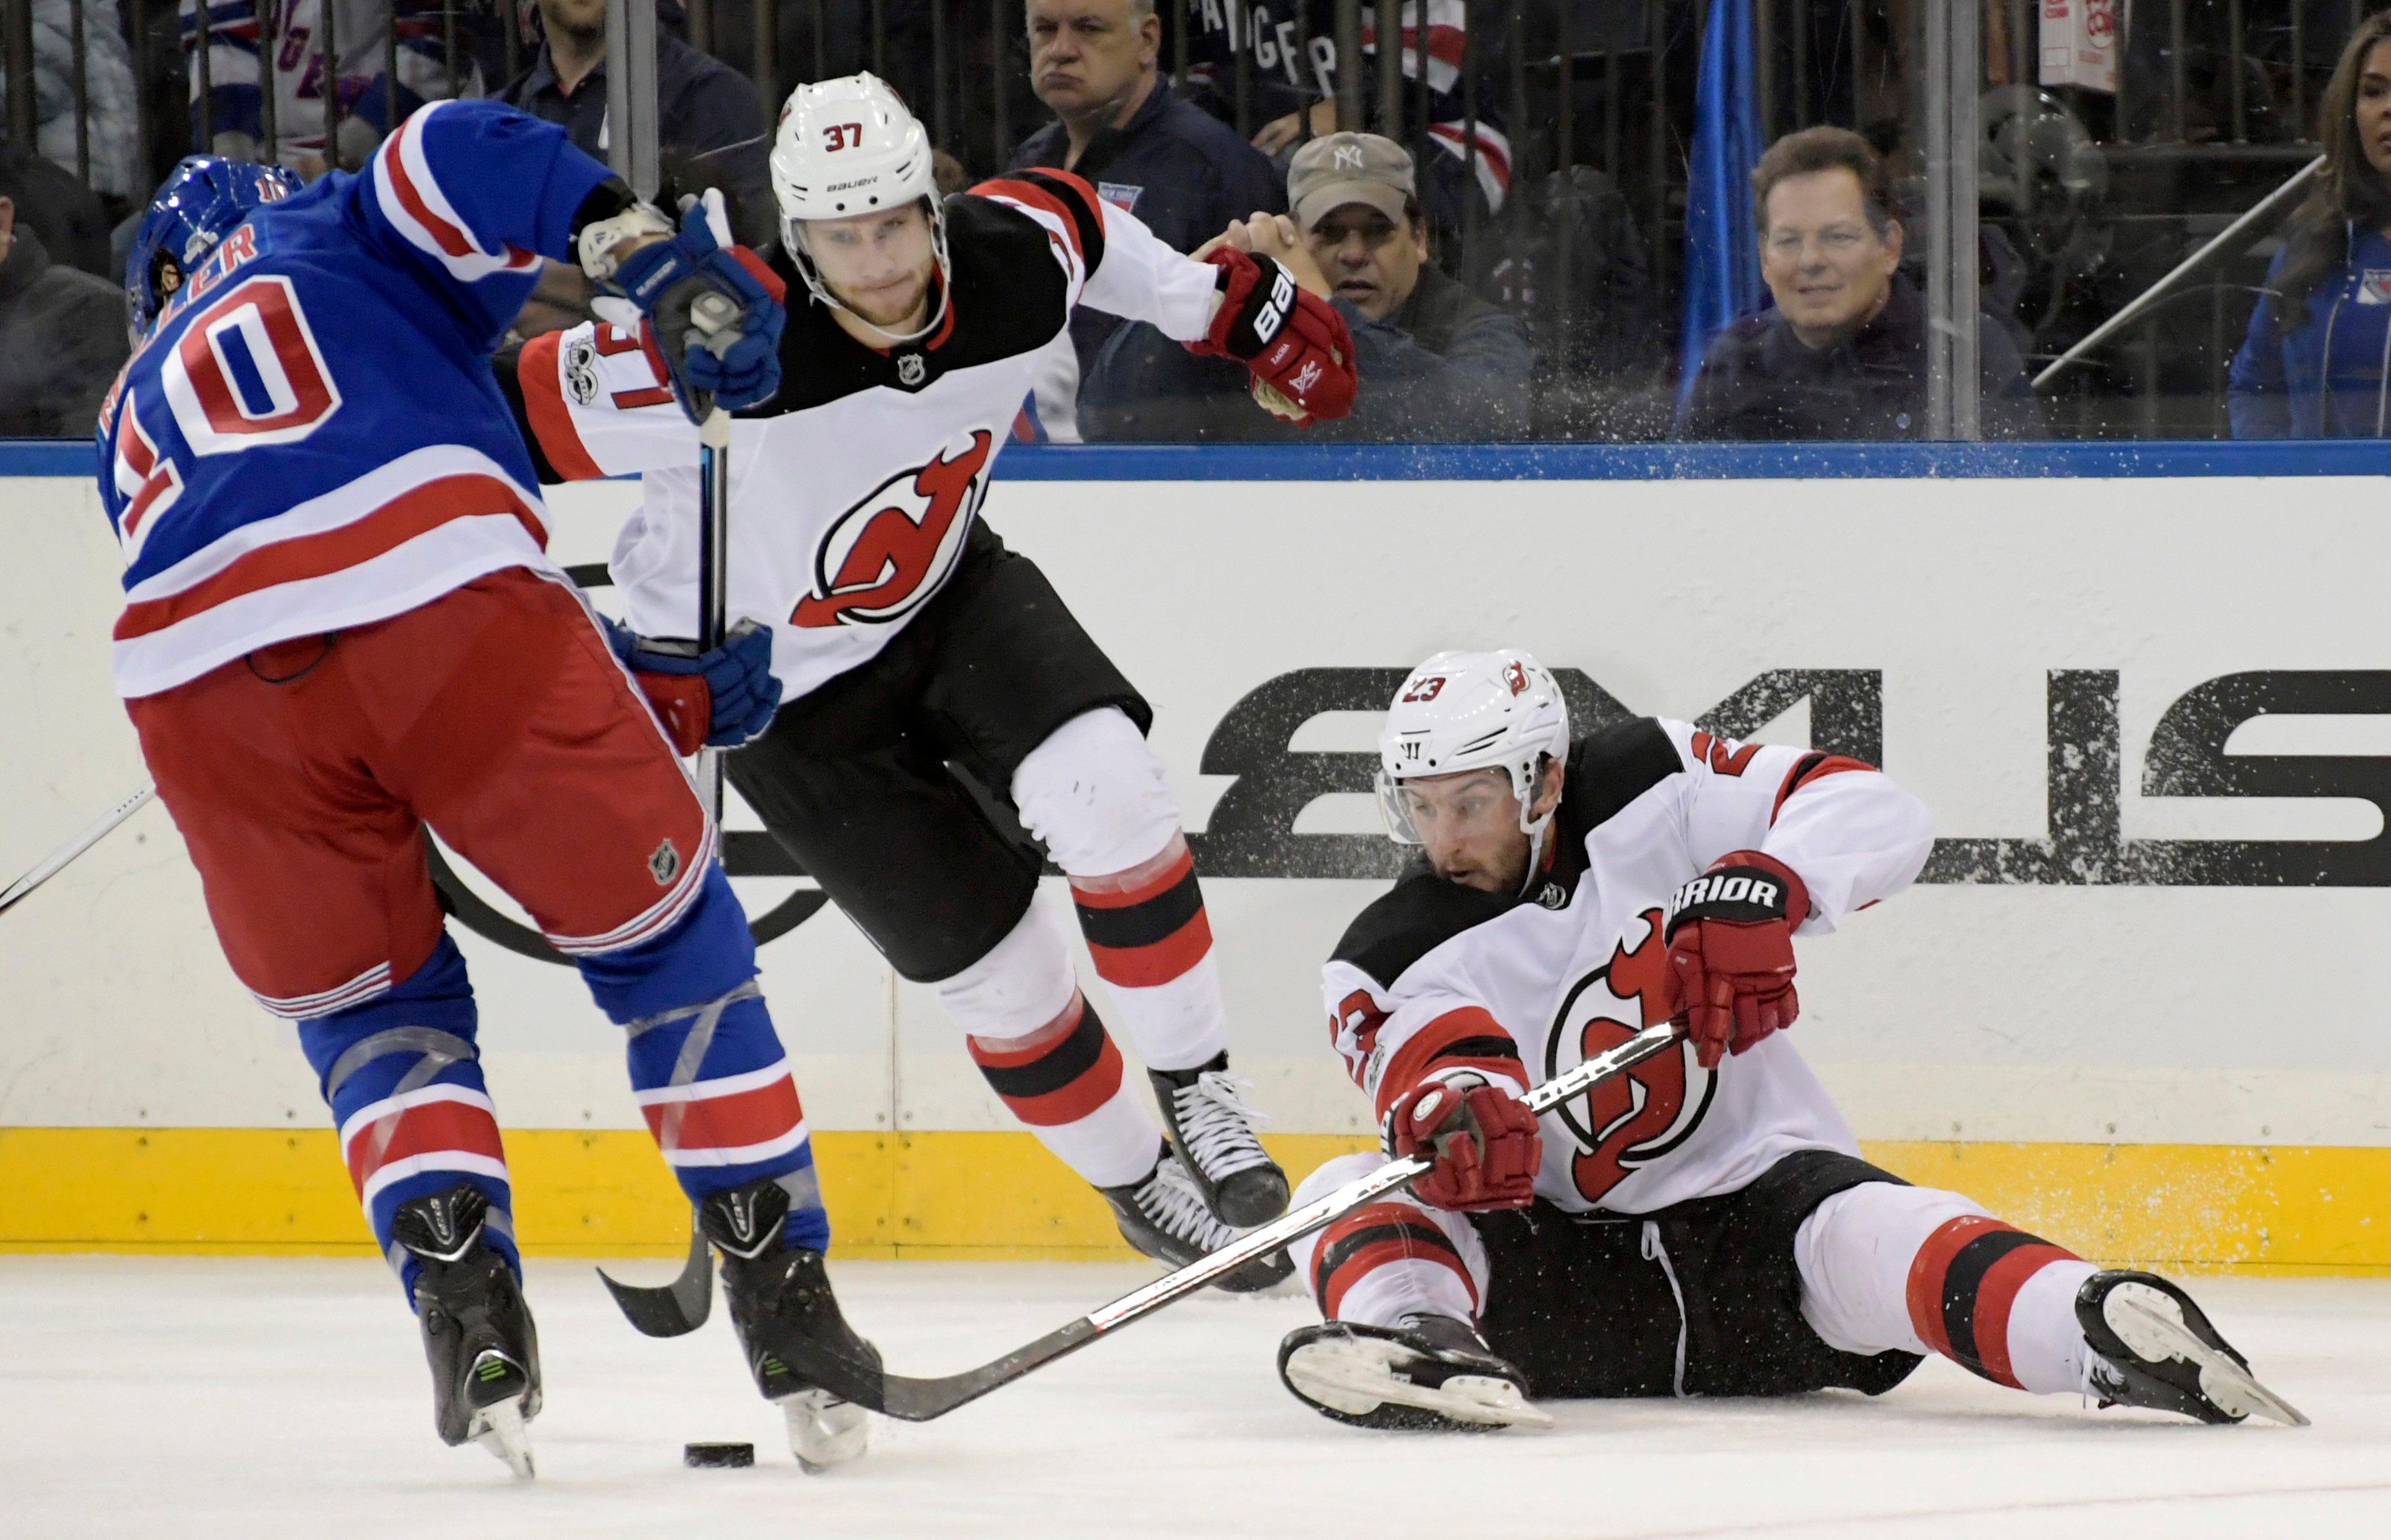 Zuccarello scores 2 to lead Rangers to 5-2 win over Devils